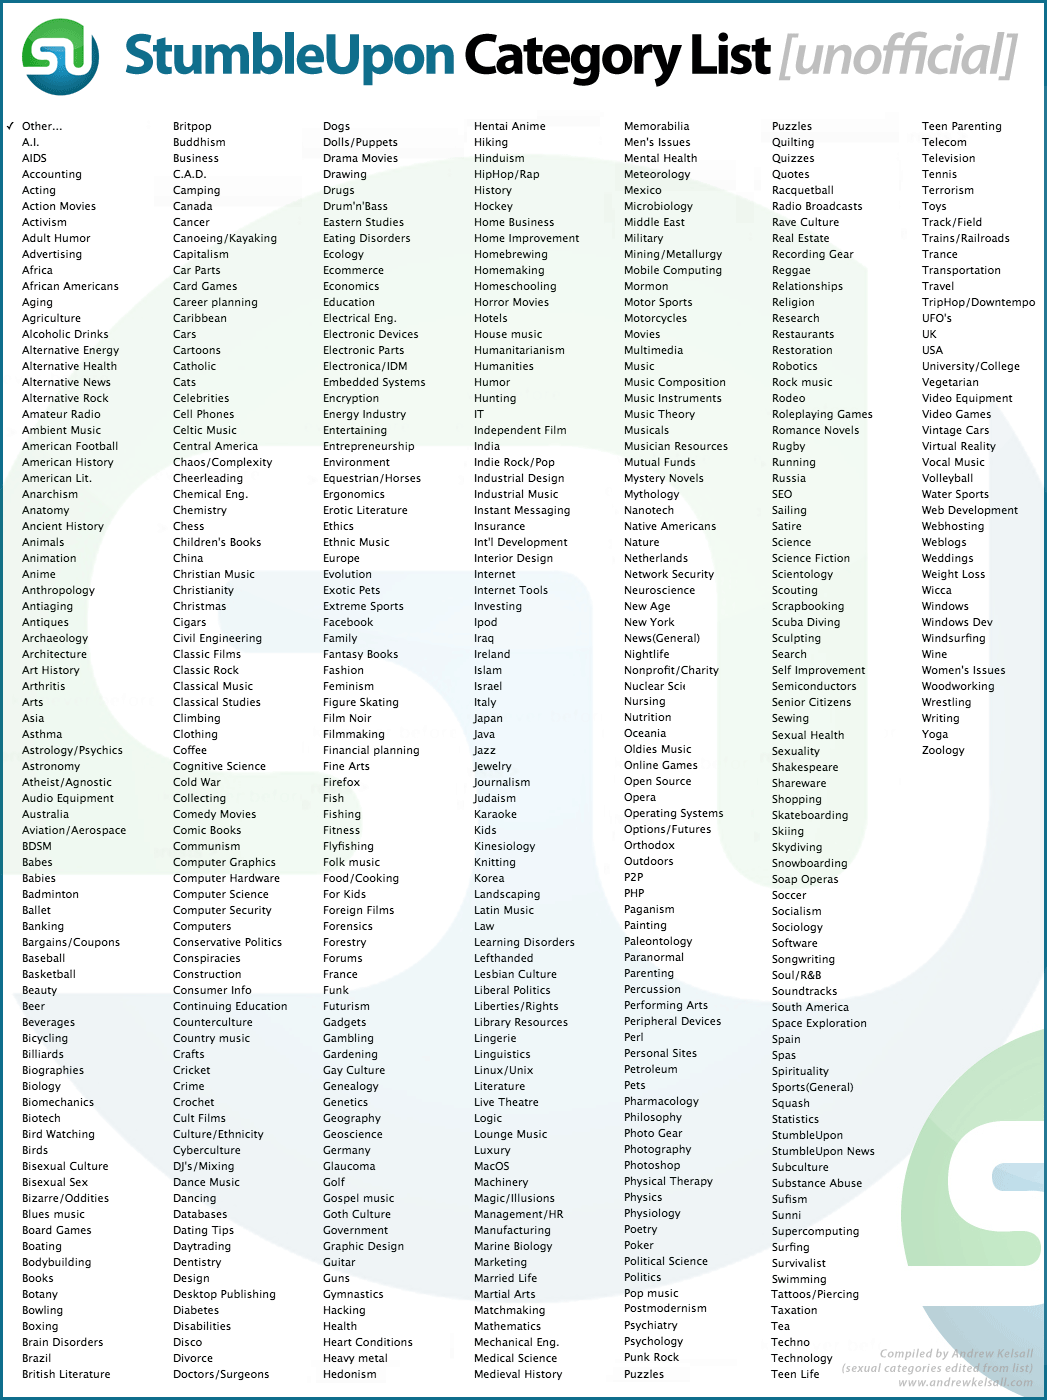 Free Stumbleupon Category List Download